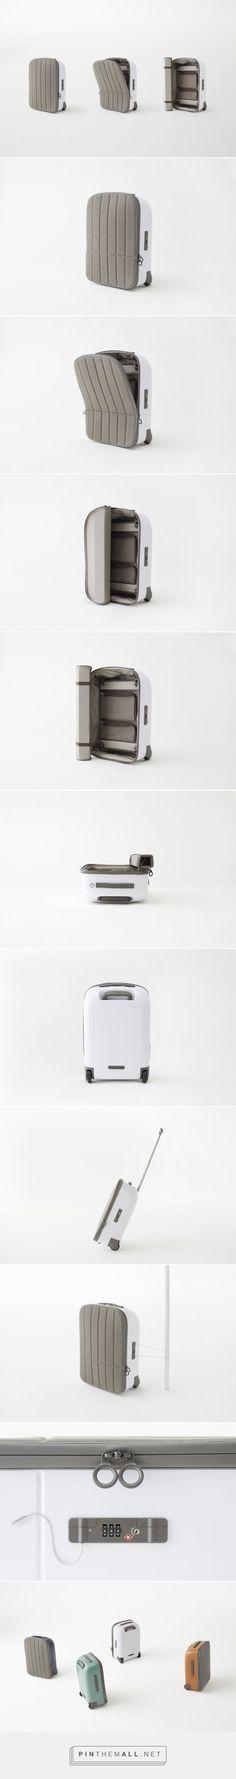 kamen suitcase for Fabbrica Pelletterie Milano - http://en.fpm.it/content/travel-hand_luggage   Designer: Nendo